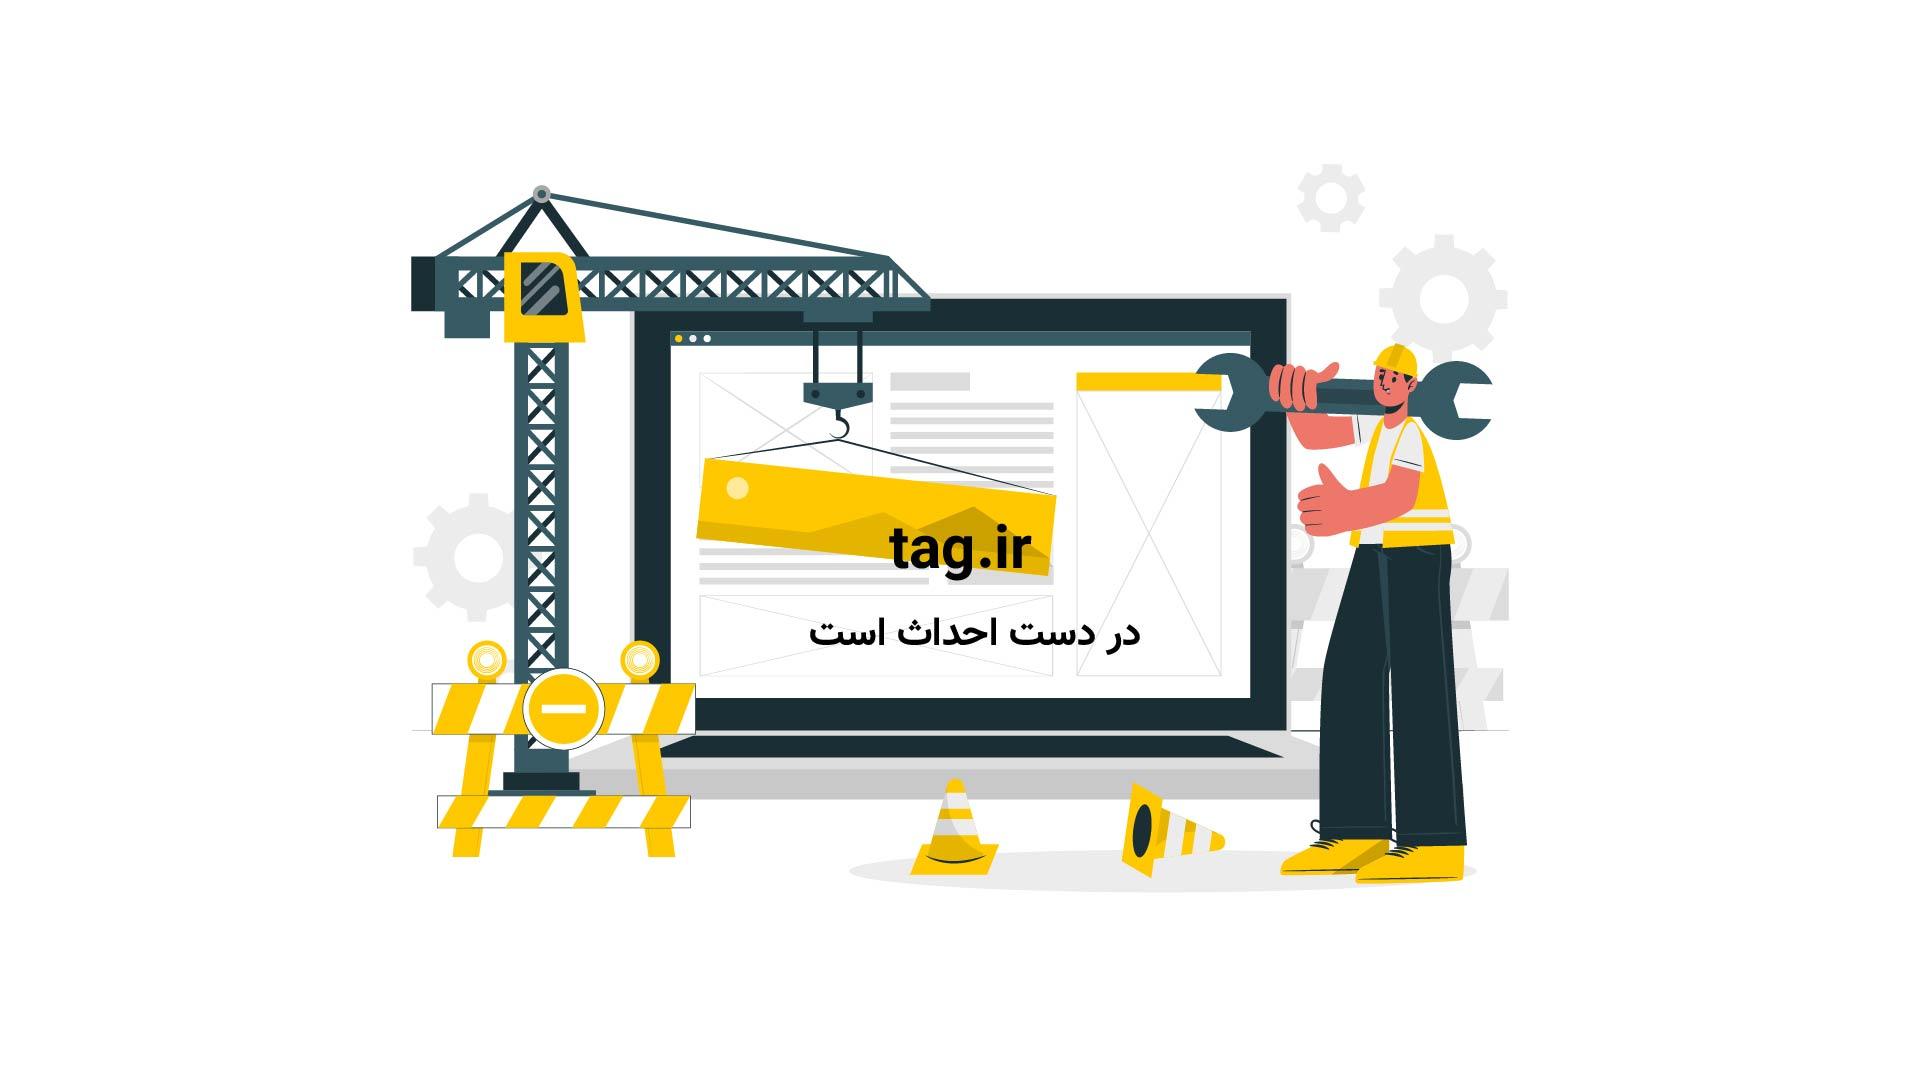 انیمیشن کوتاه | تگ